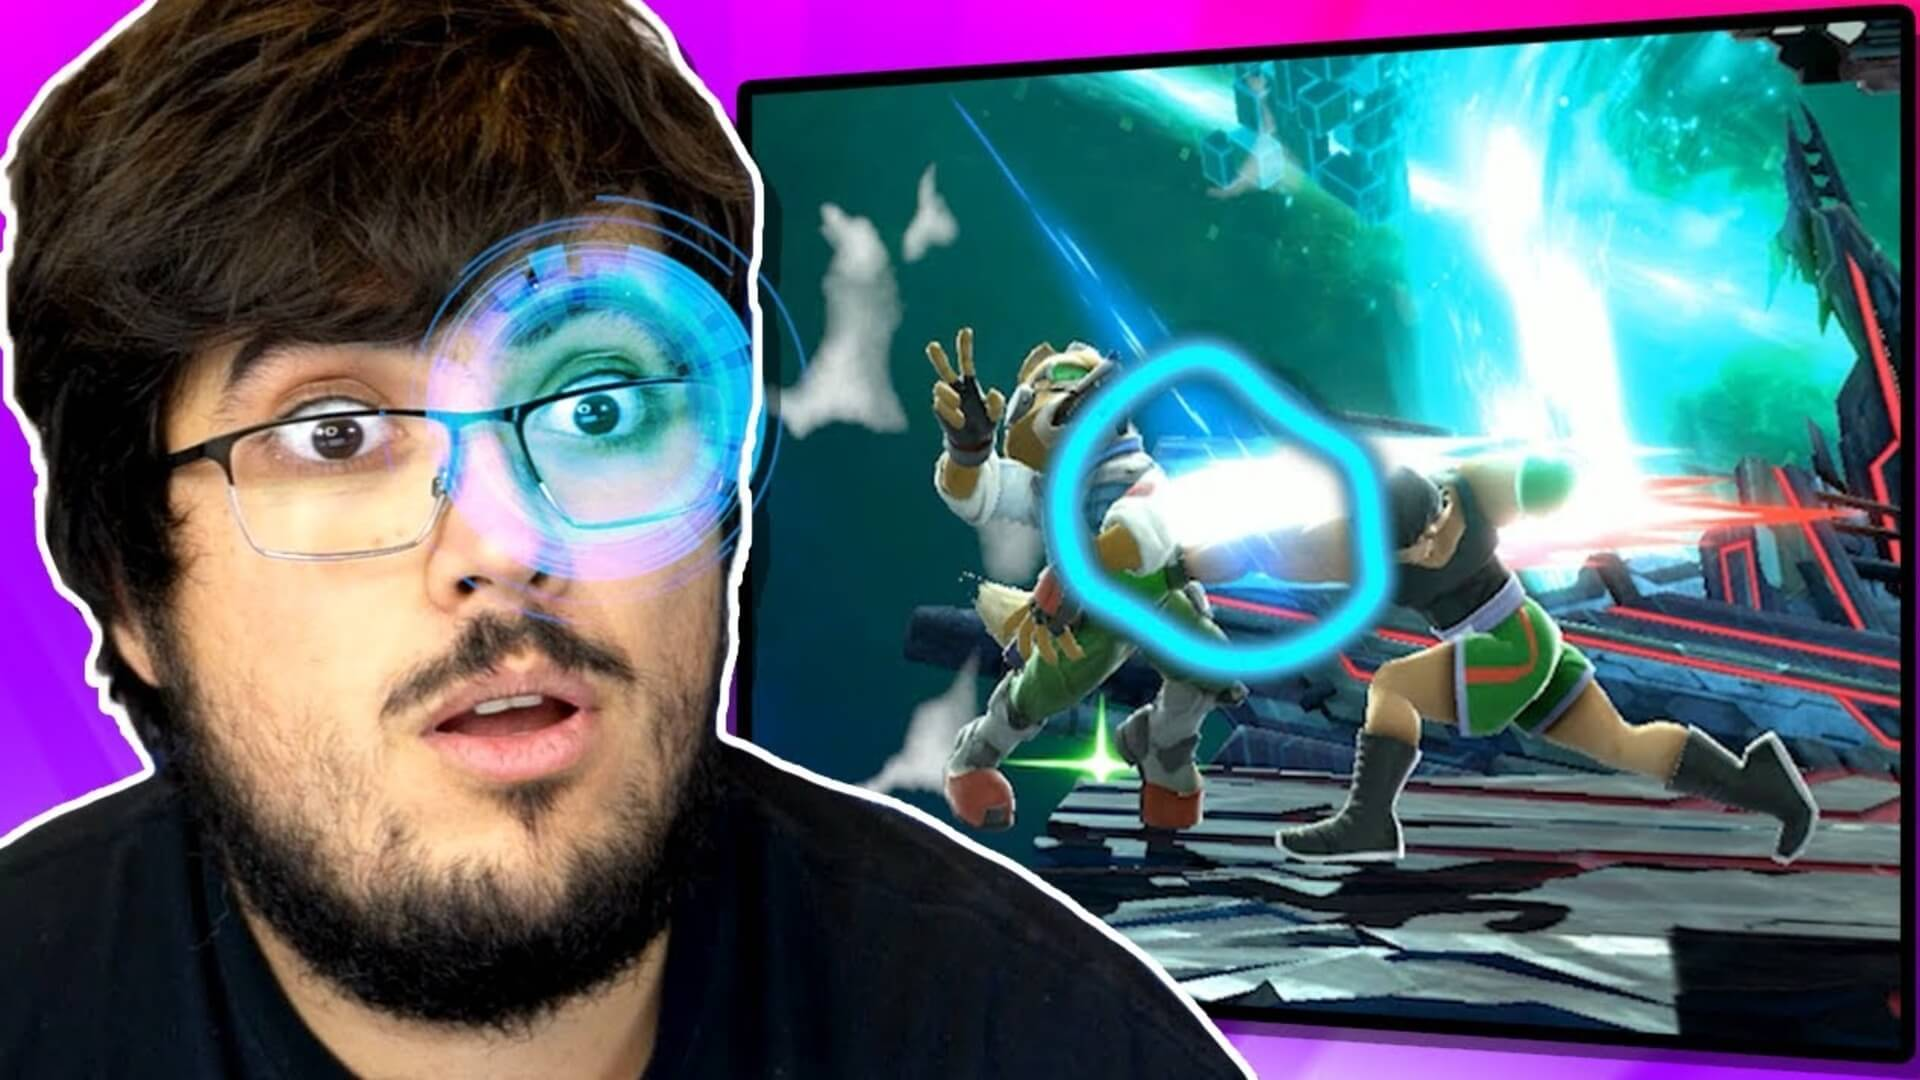 ZeRo uses eye tracker to breakdown Super Smash Bros. Ultimate